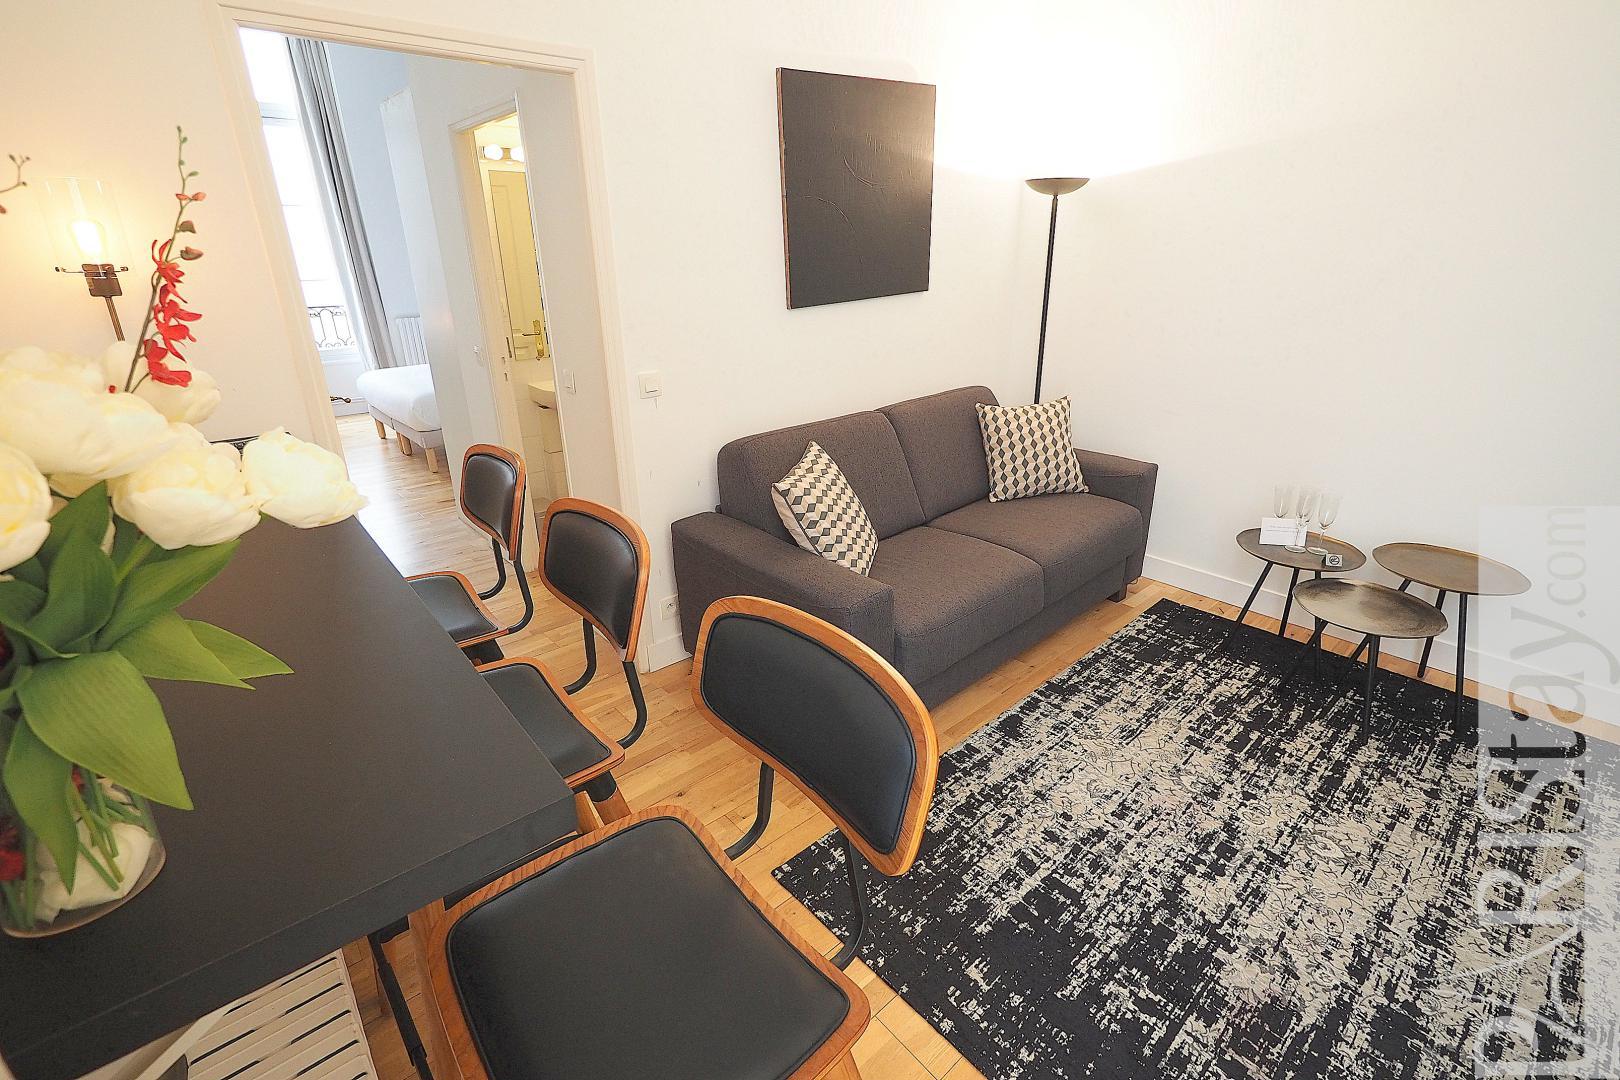 paris vacation apartments rental le marais furnished 2 bedrooms